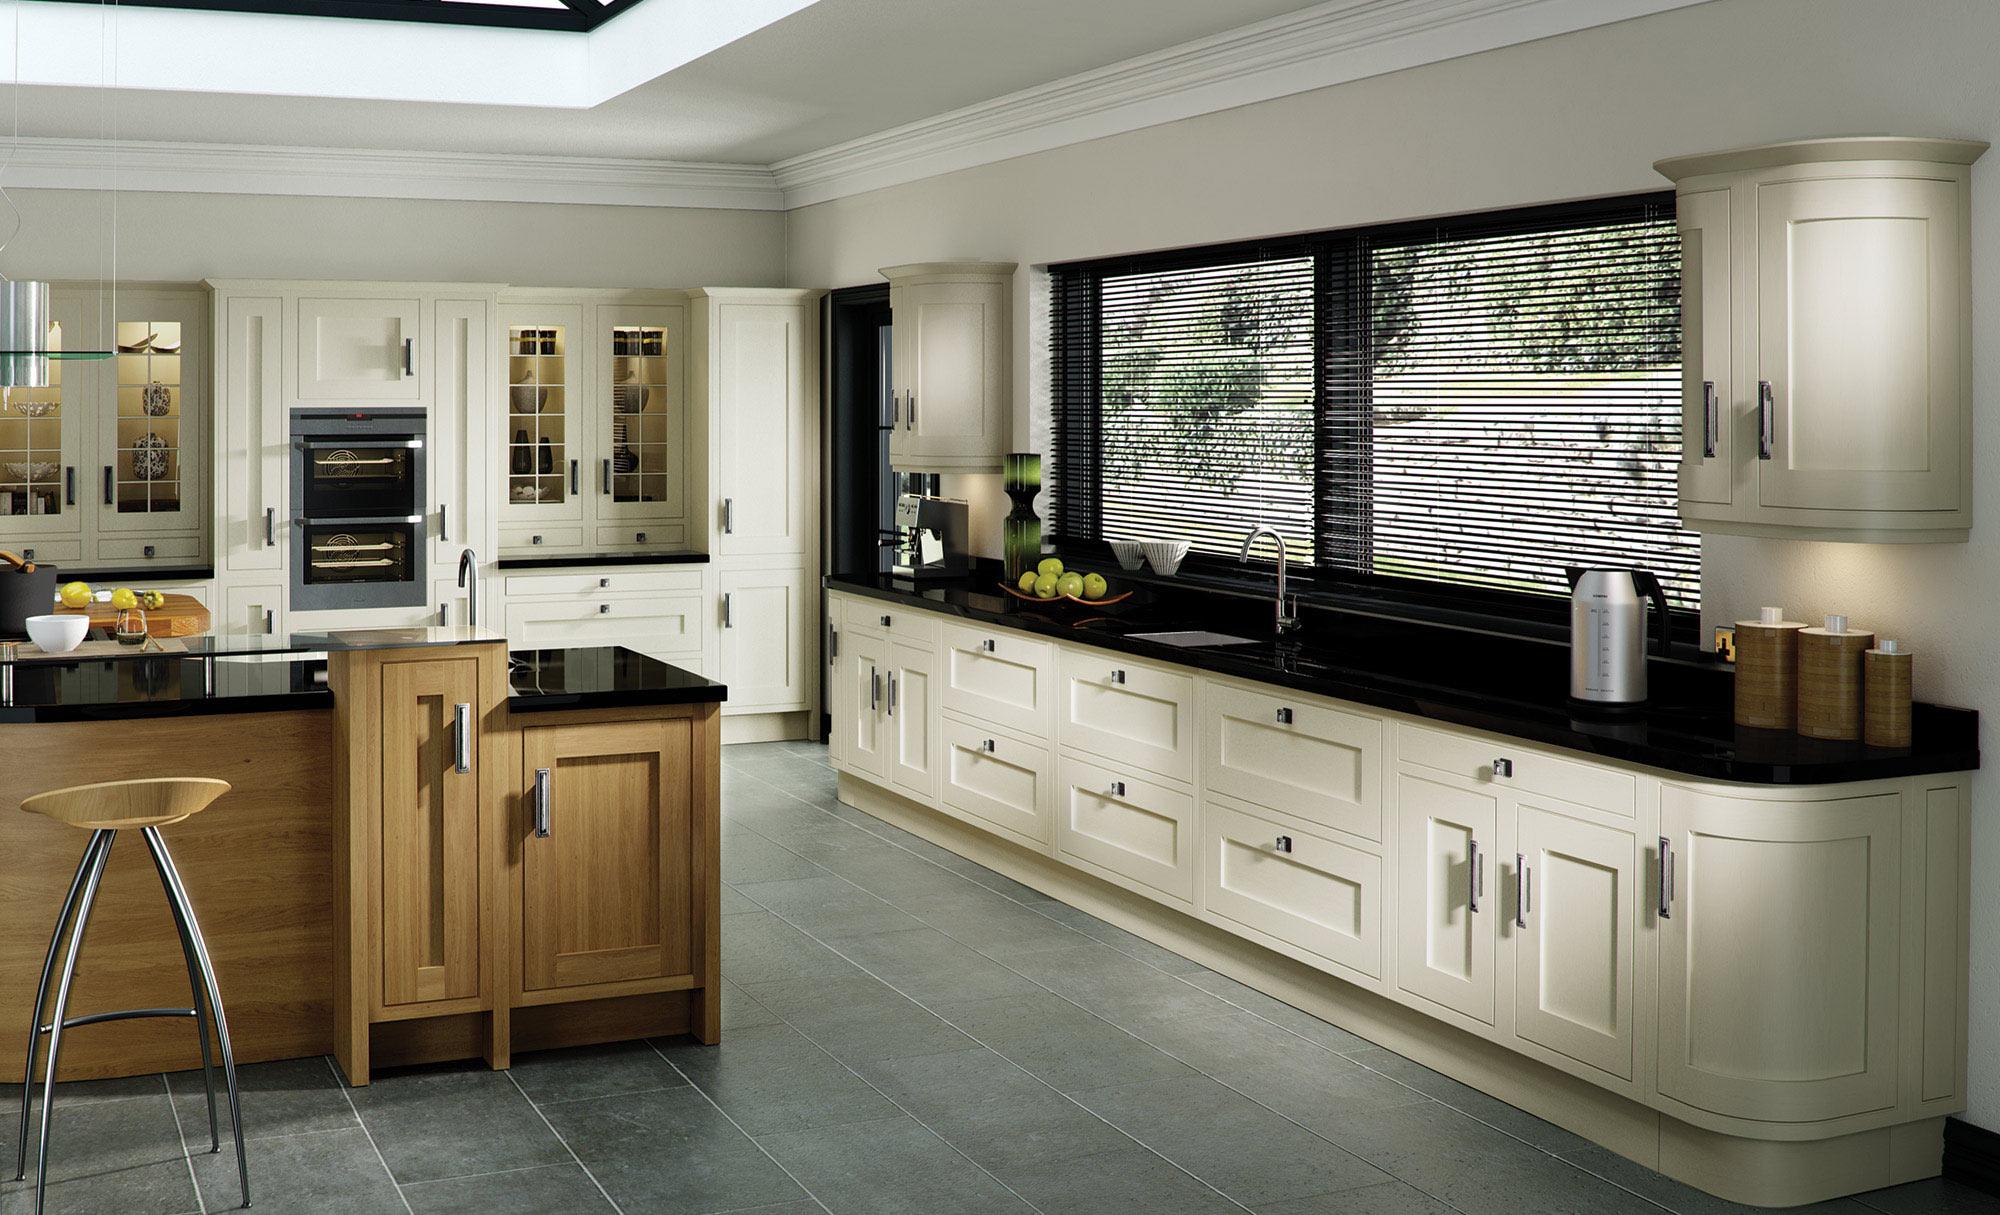 Uform Iona Inframe Light Oak & White Cotton Kitchen